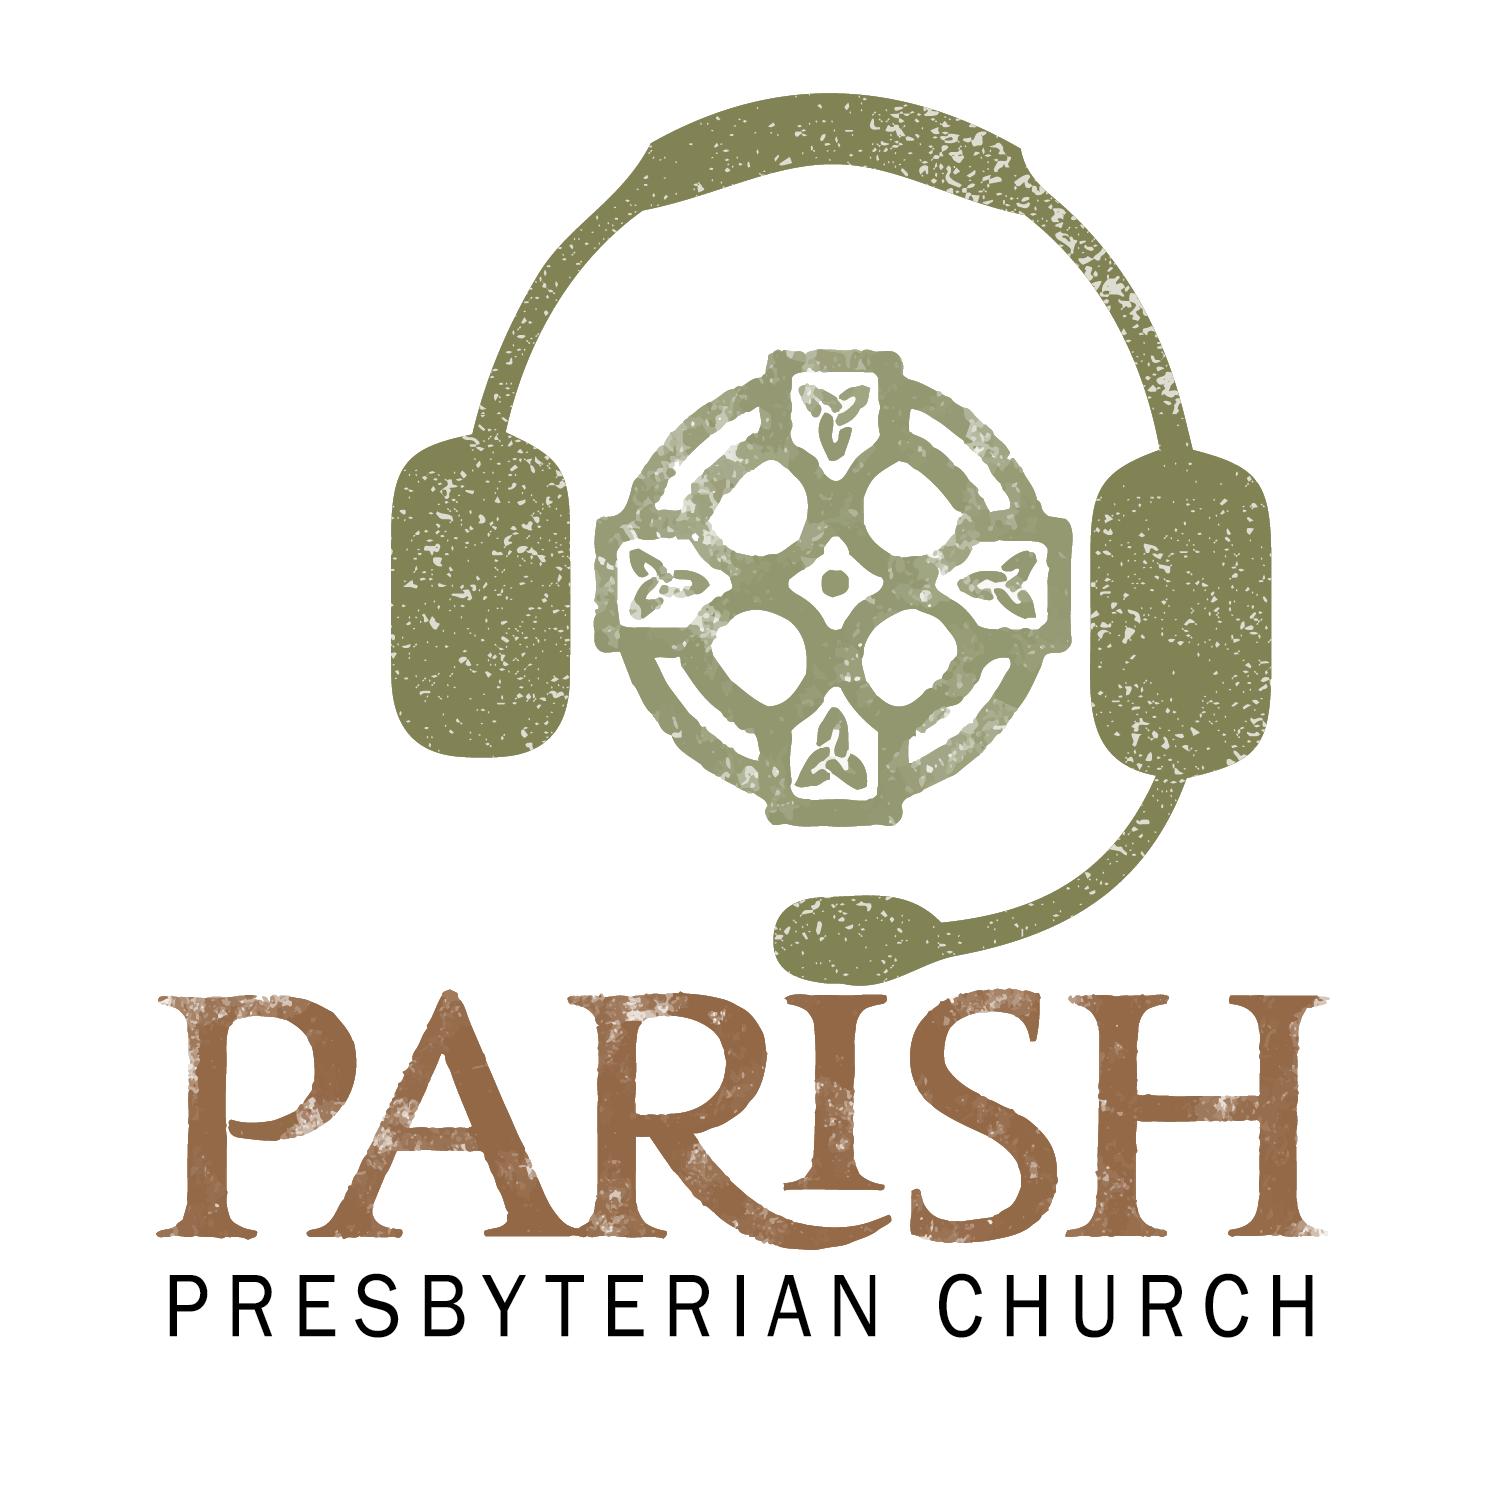 Parish Presbyterian Church Podcasts show art